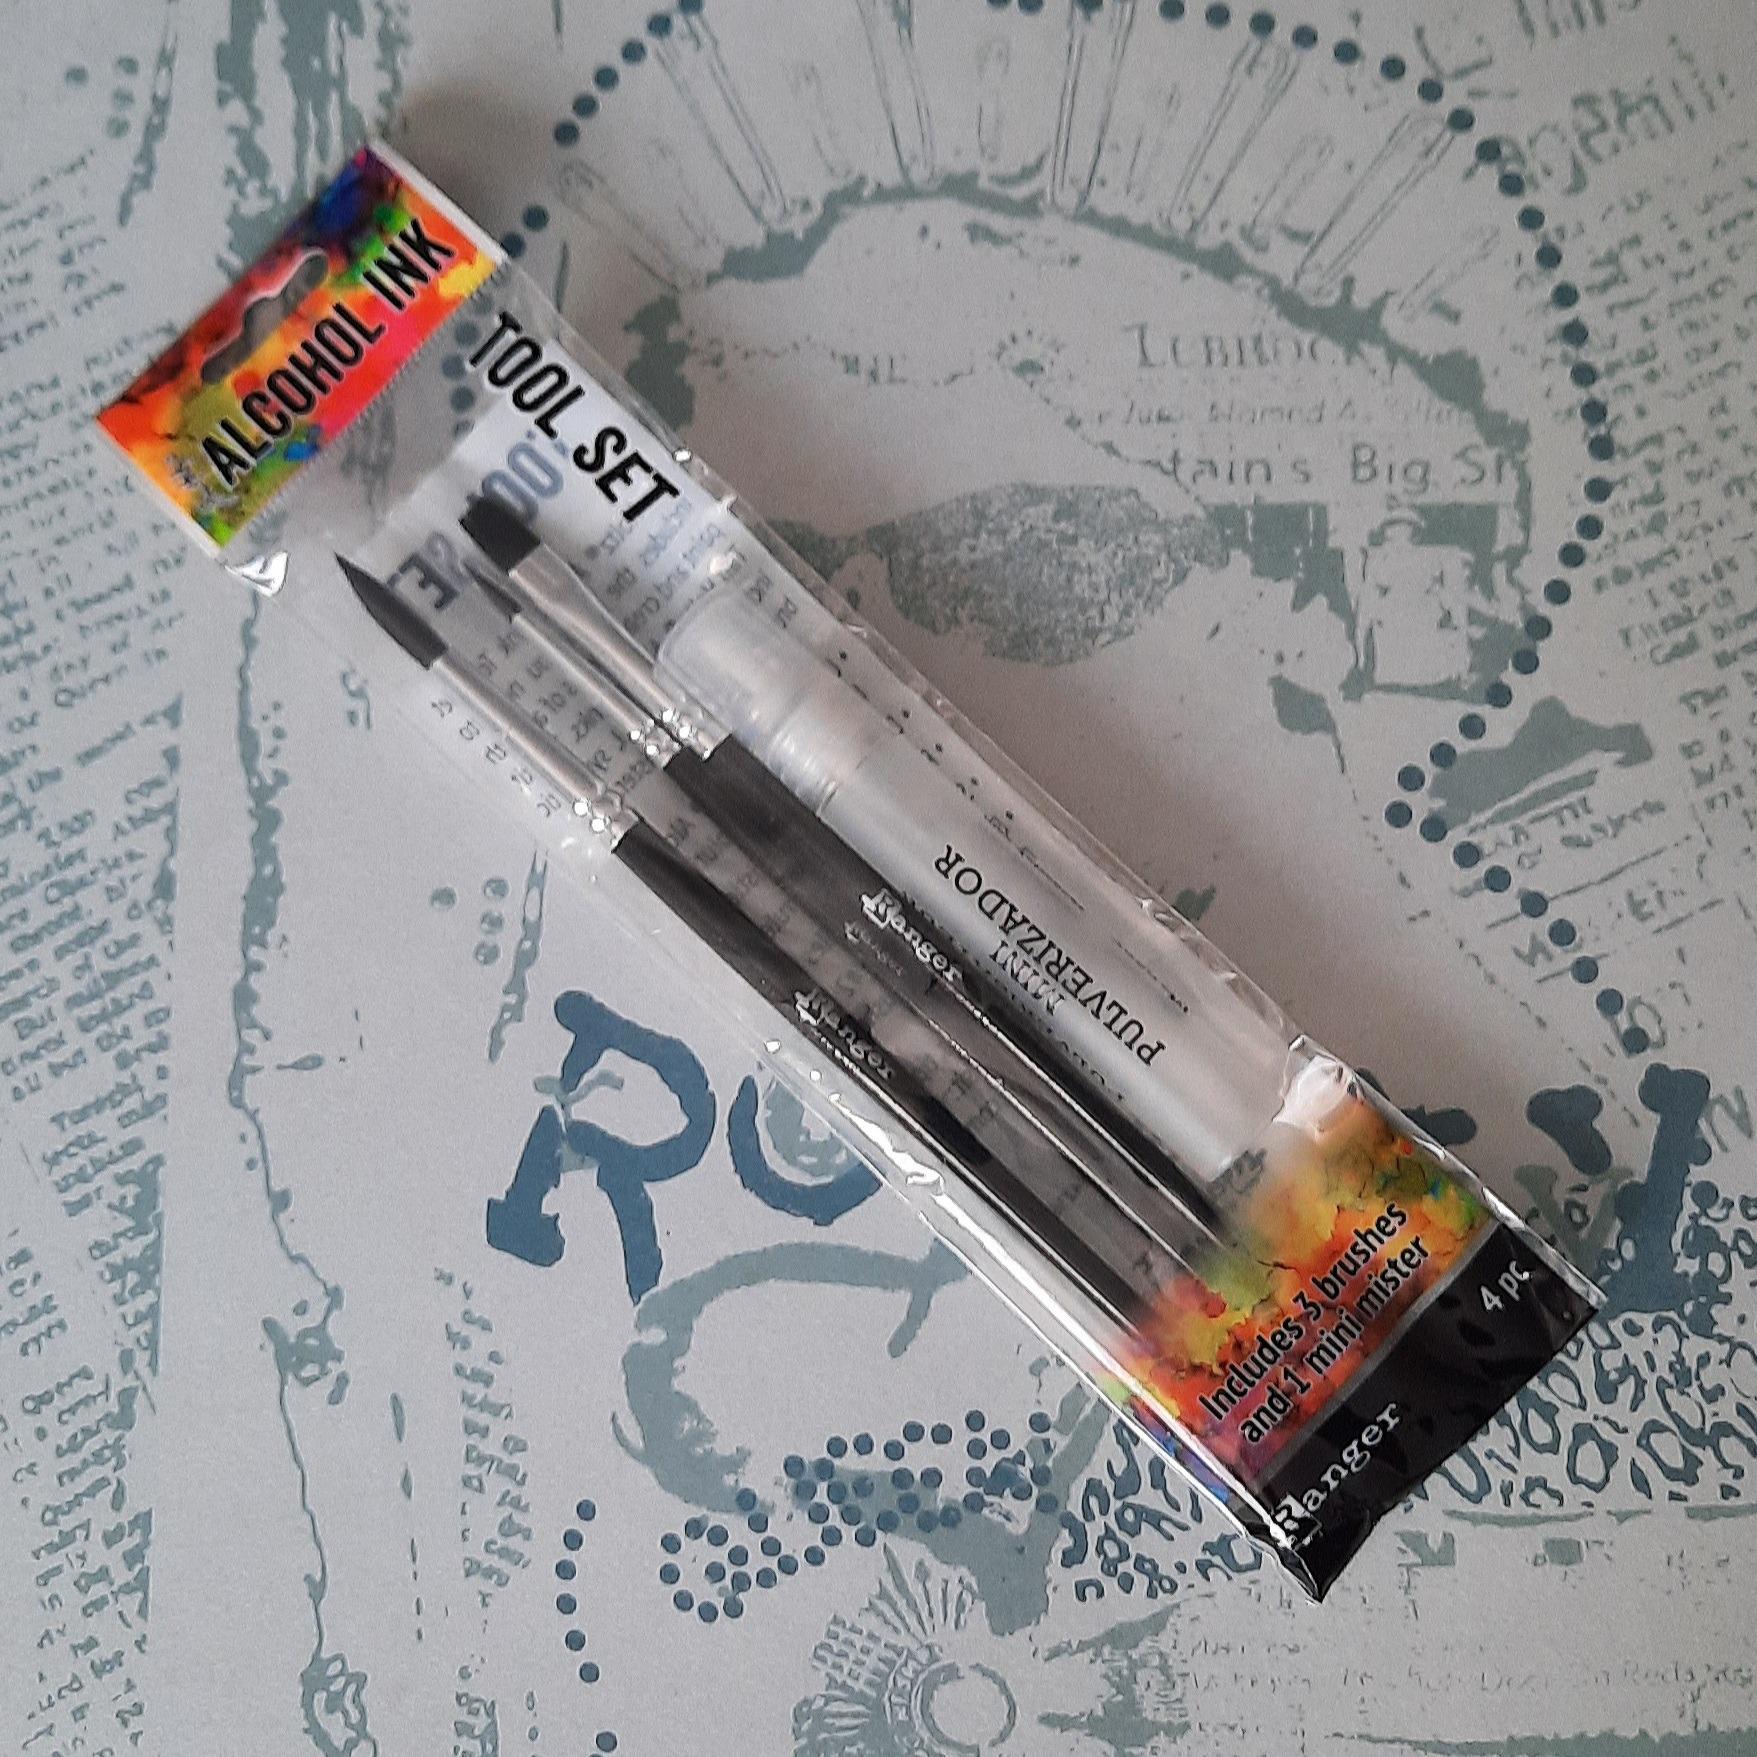 Tim Holtz Alcohol Ink Tool Kit